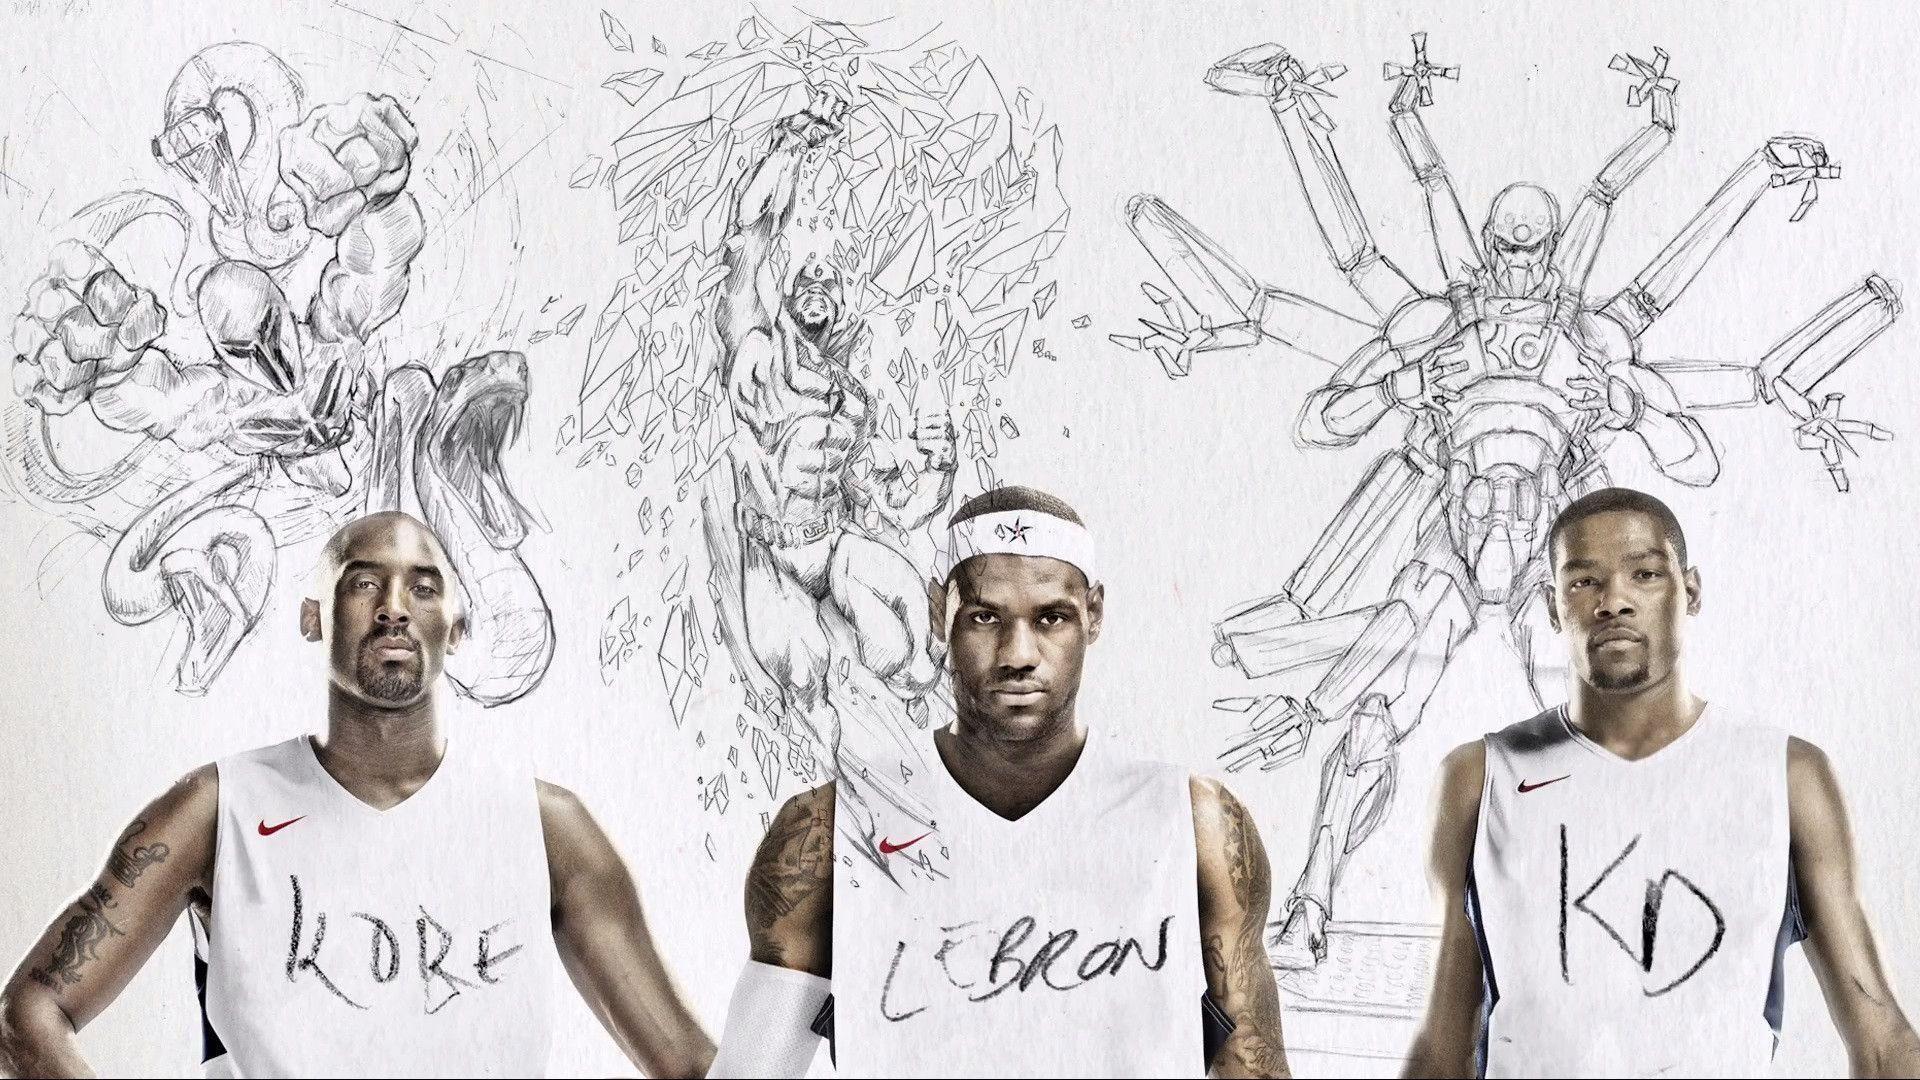 Nba X Nike Wallpaper: Nike Basketball Wallpapers (60+ Images